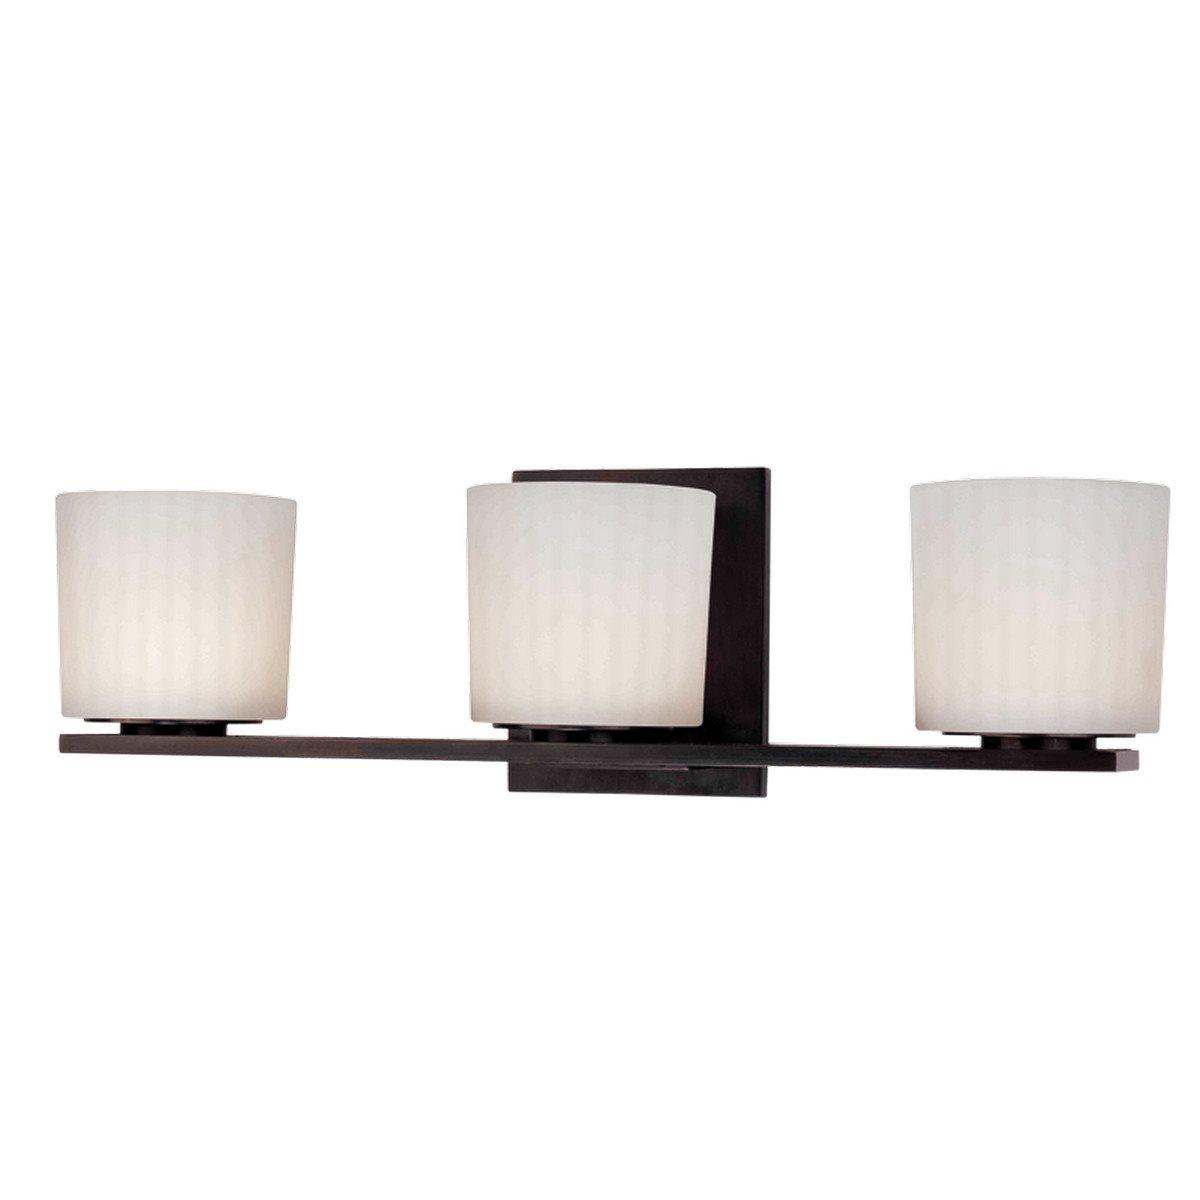 Bathroom Vanities Woodbridge Hudson Valley Lighting 7743 Woodbridge Modern Contemporary